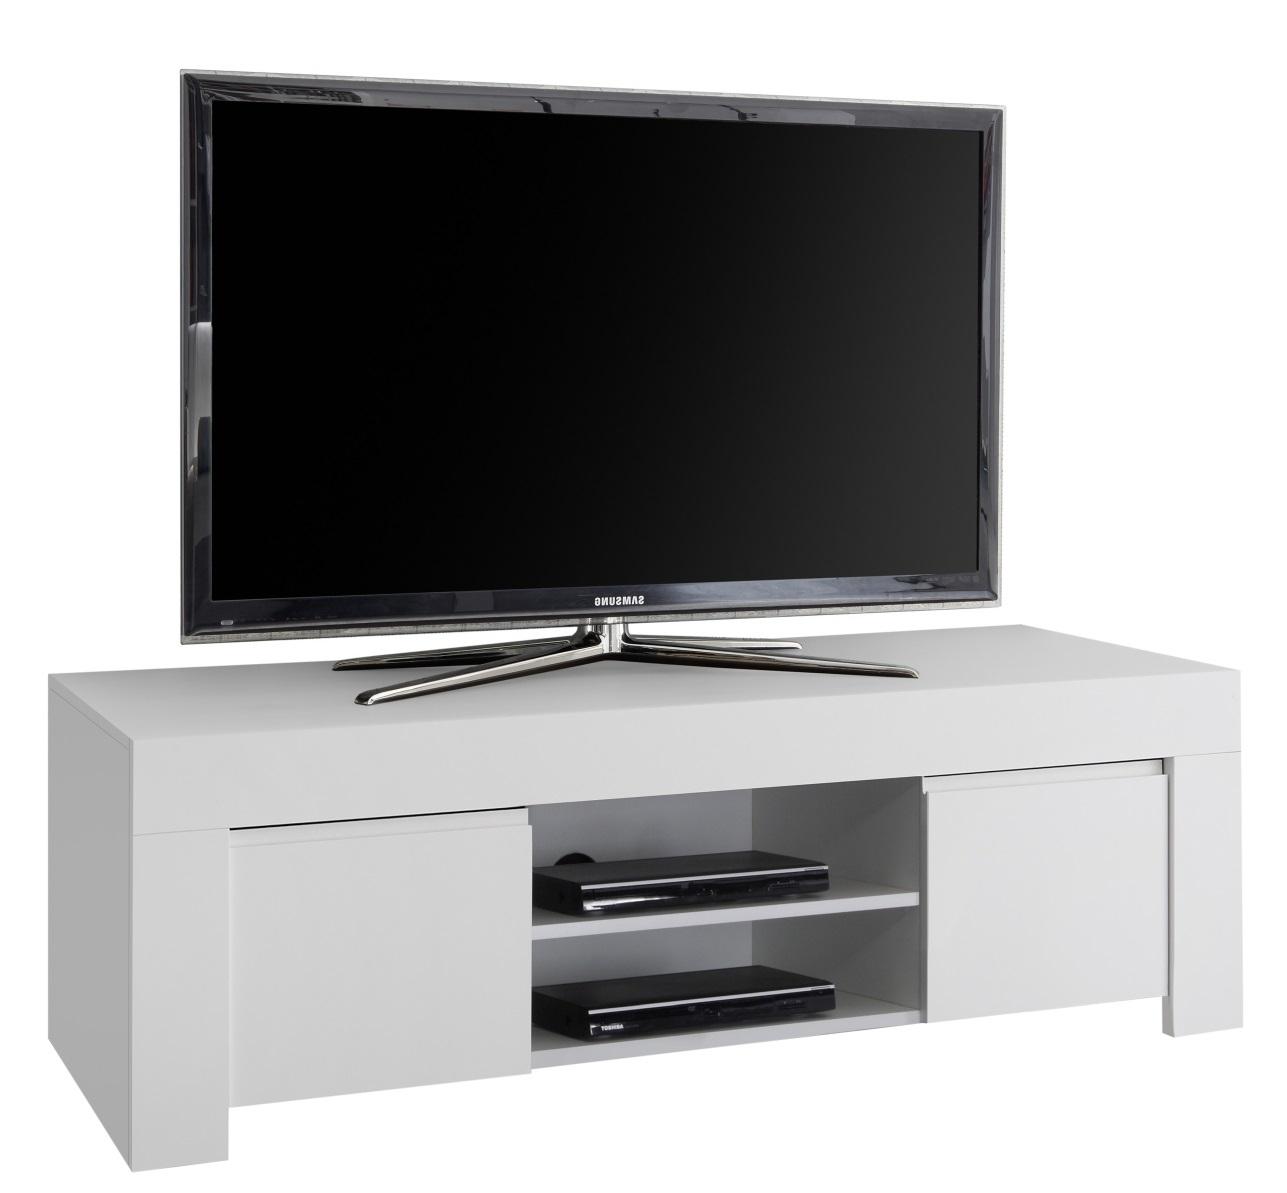 Tv-meubel Firenze 138 cm breed in mat wit